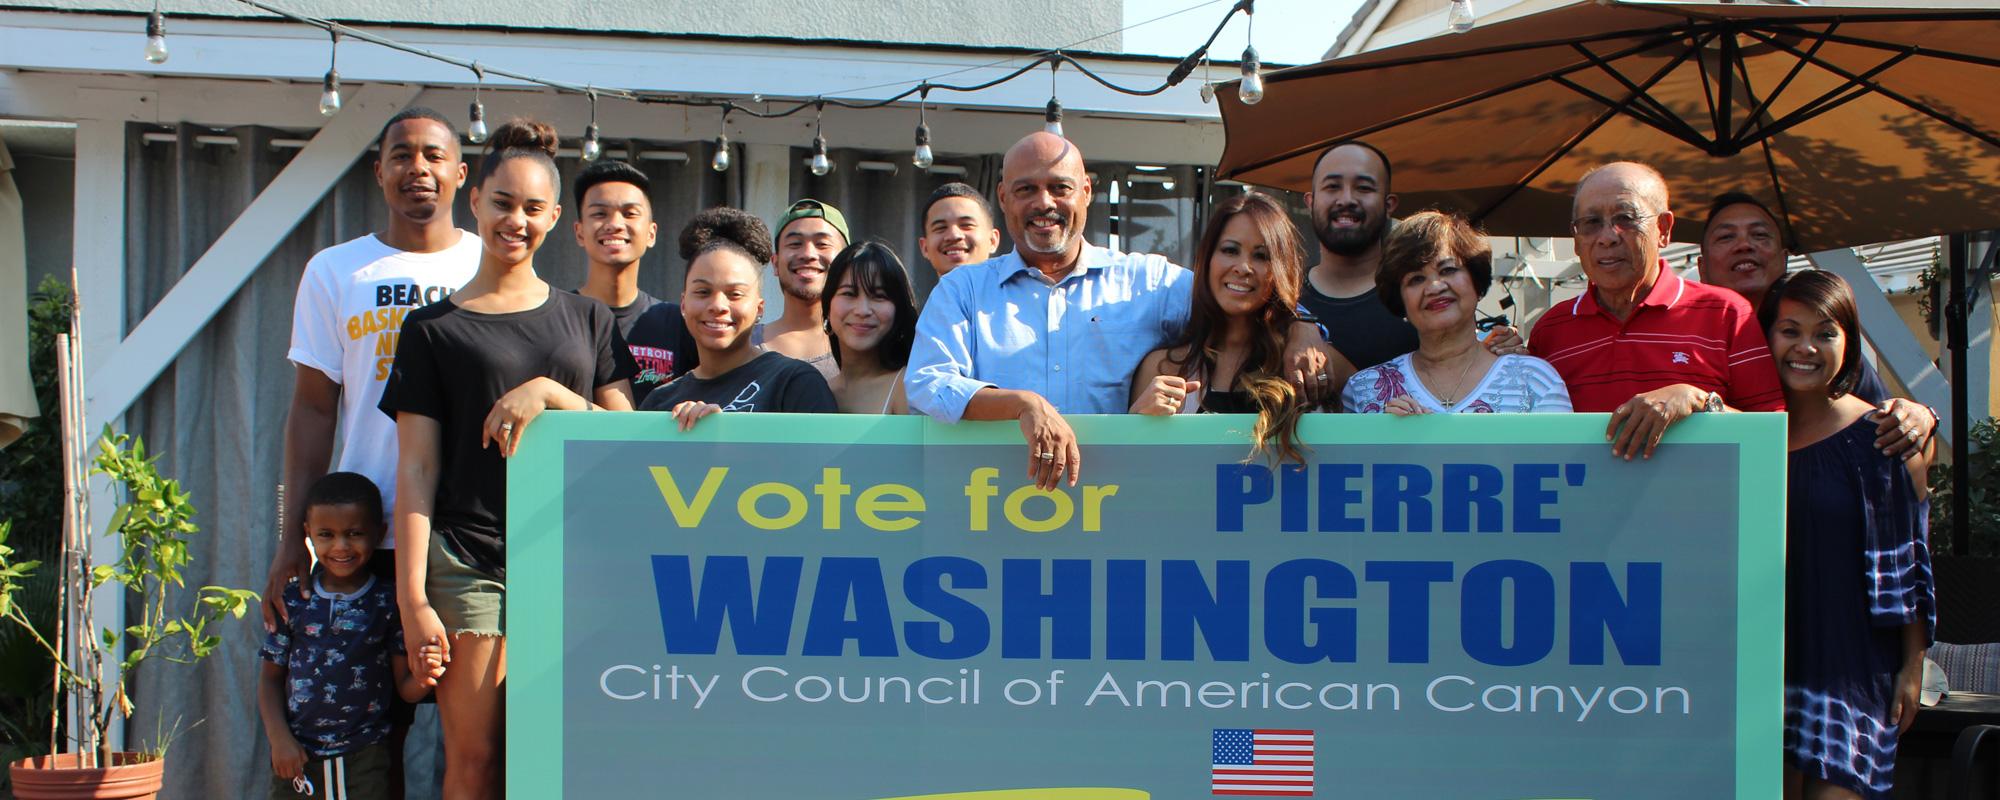 Pierre Washington Group Photo